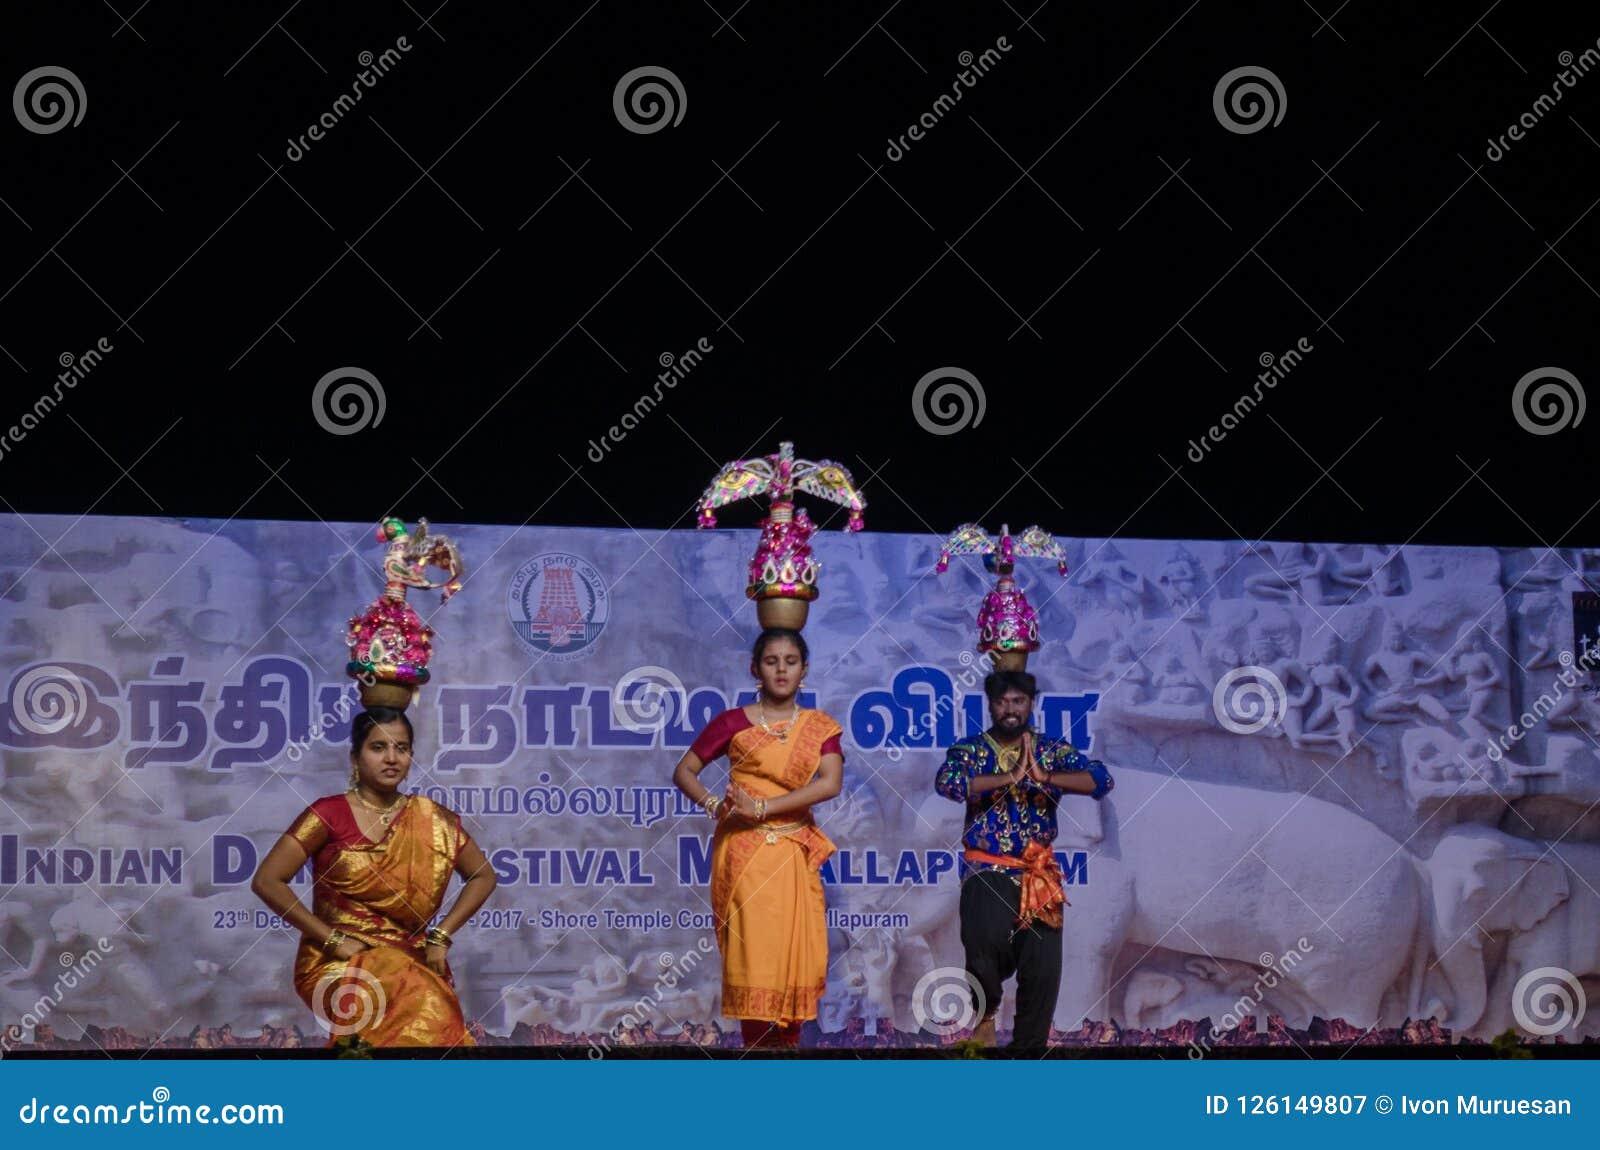 Indian Dance Festival, Mamallapuram 2016-17